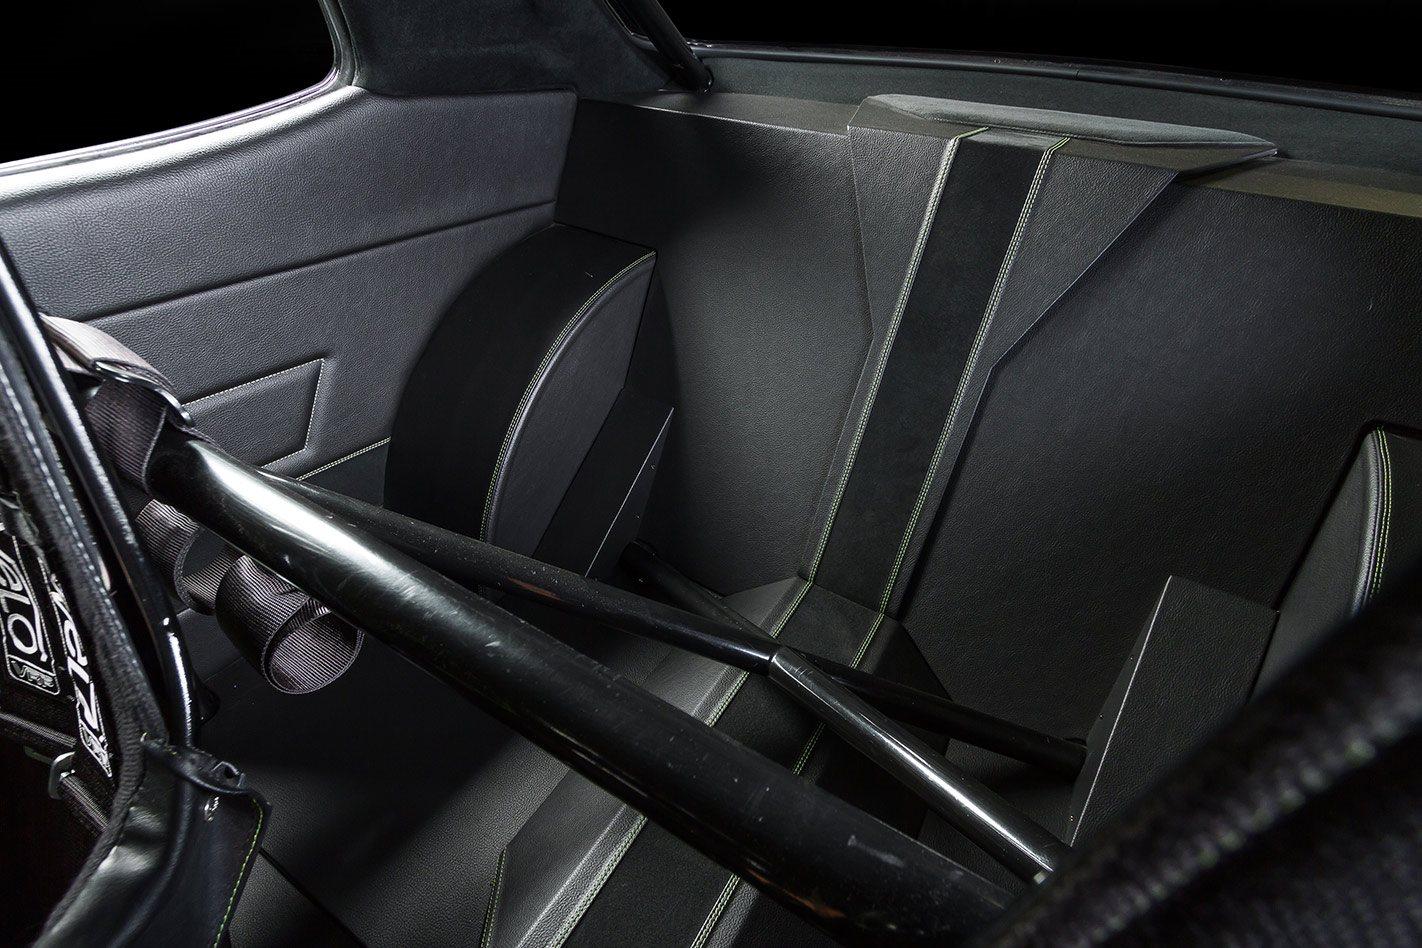 Mitsubishi Galant interior rear